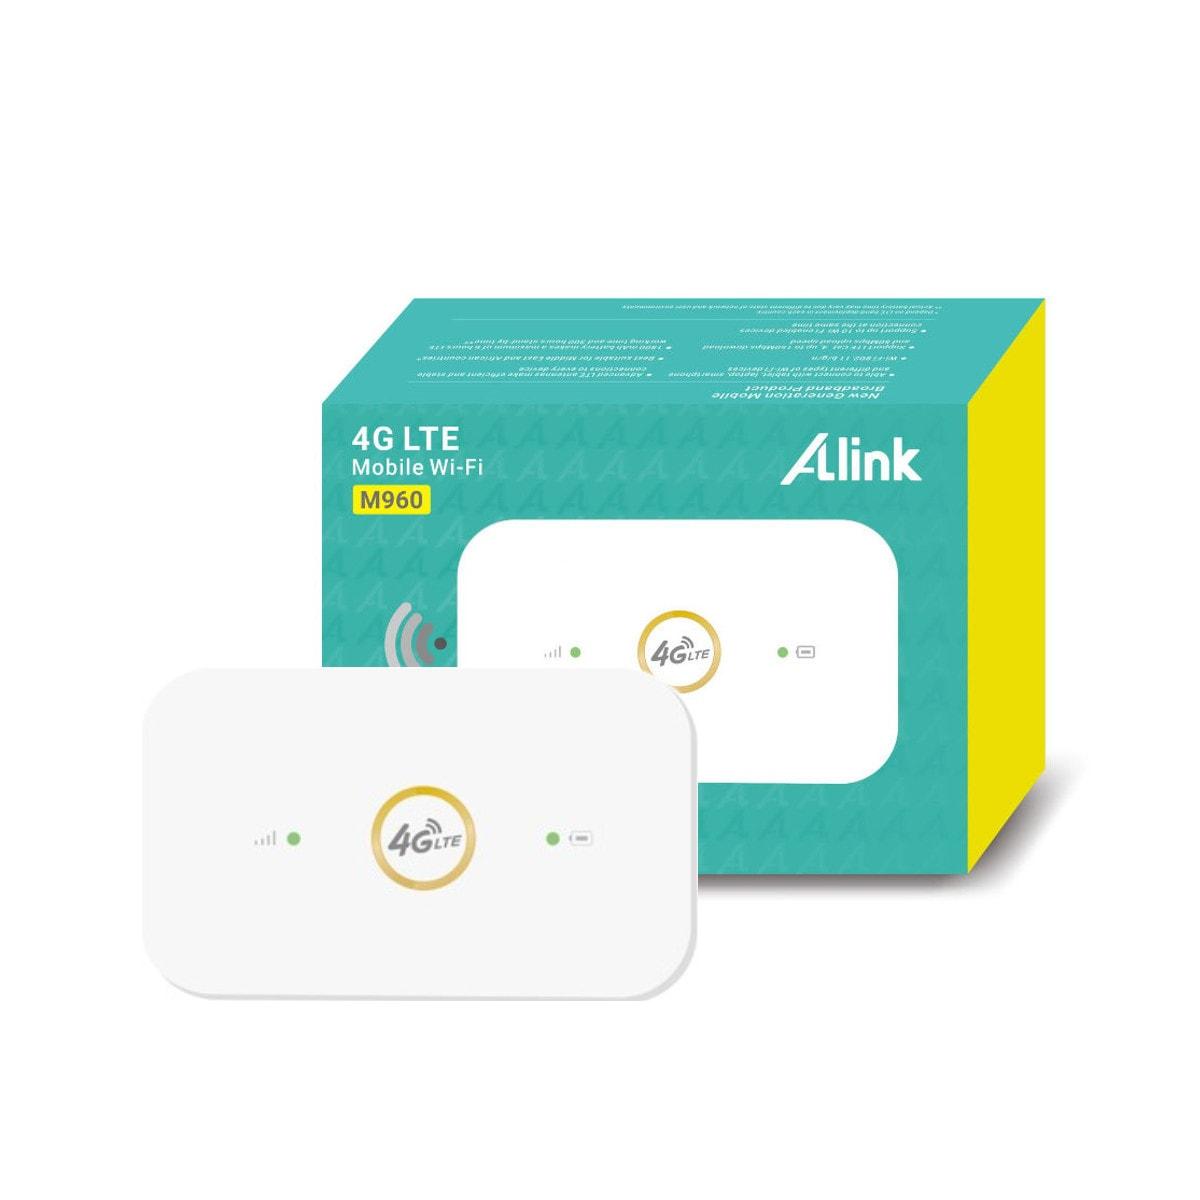 Router mobilny Alink M960 4G LTE 150Mbps SIM - 2